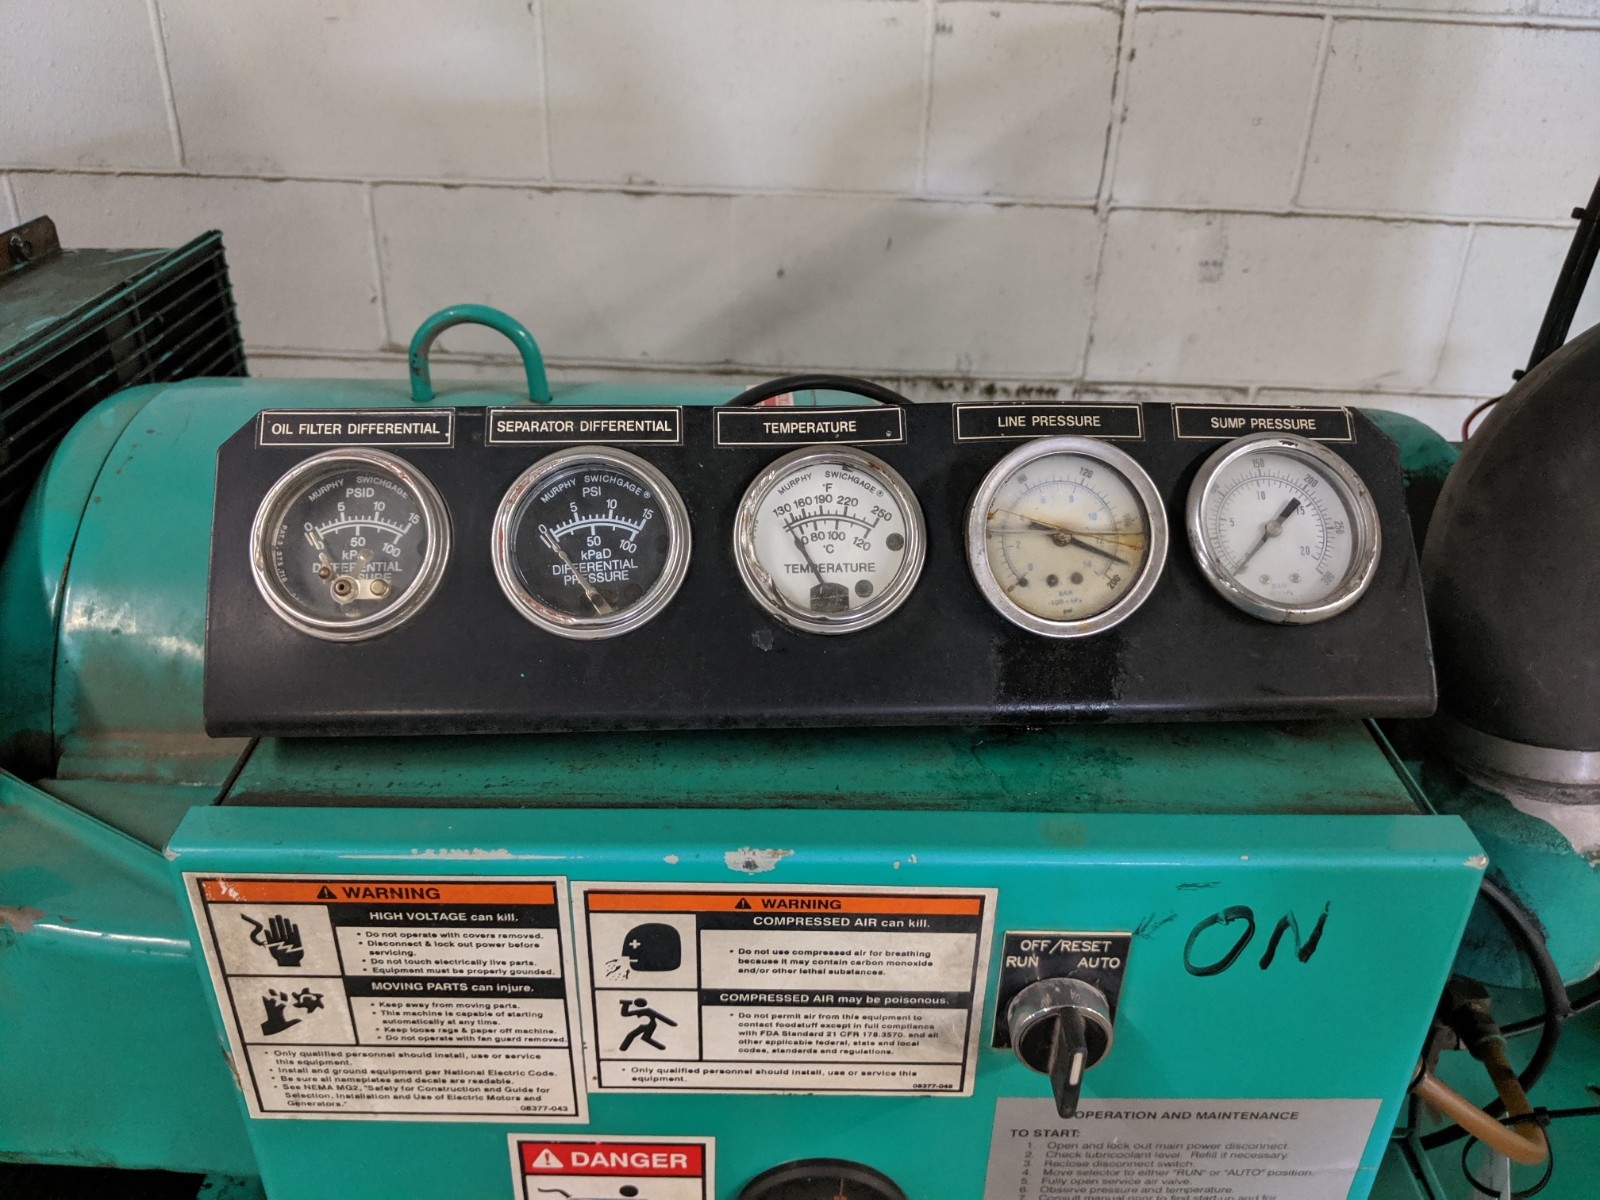 Lot 203 - Palatek Rotary Screw Air Compressor